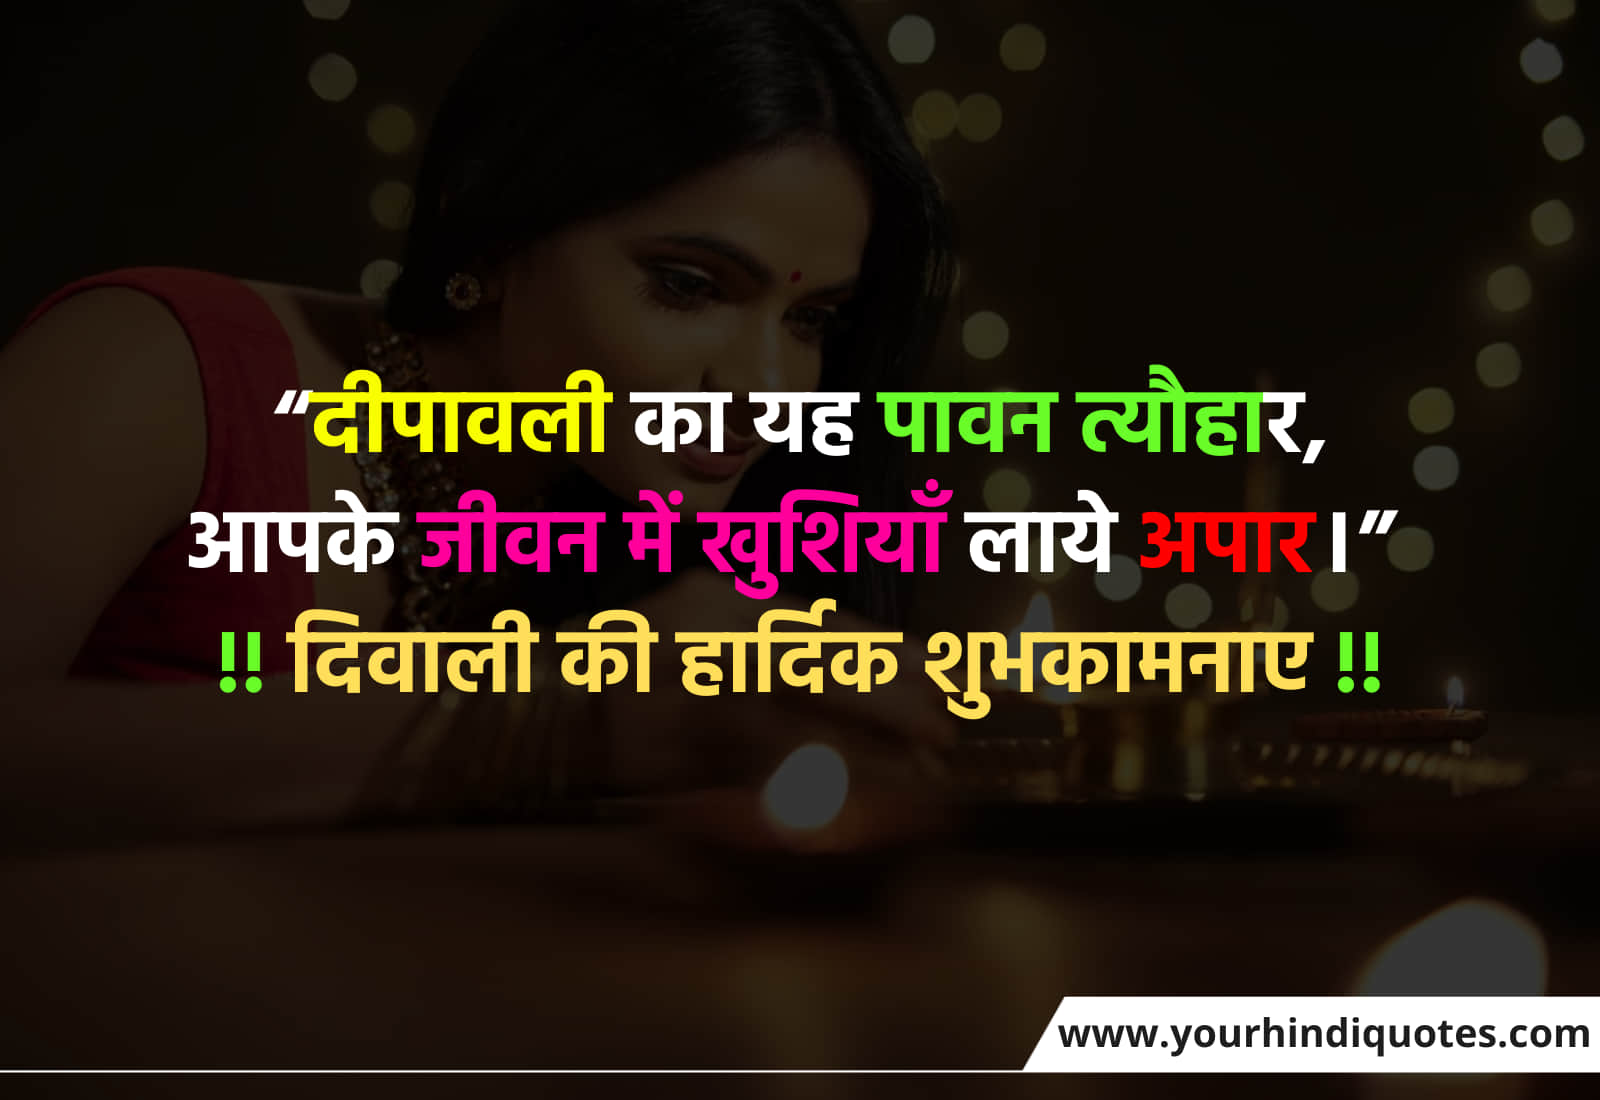 Hindi Happy Diwali Messages